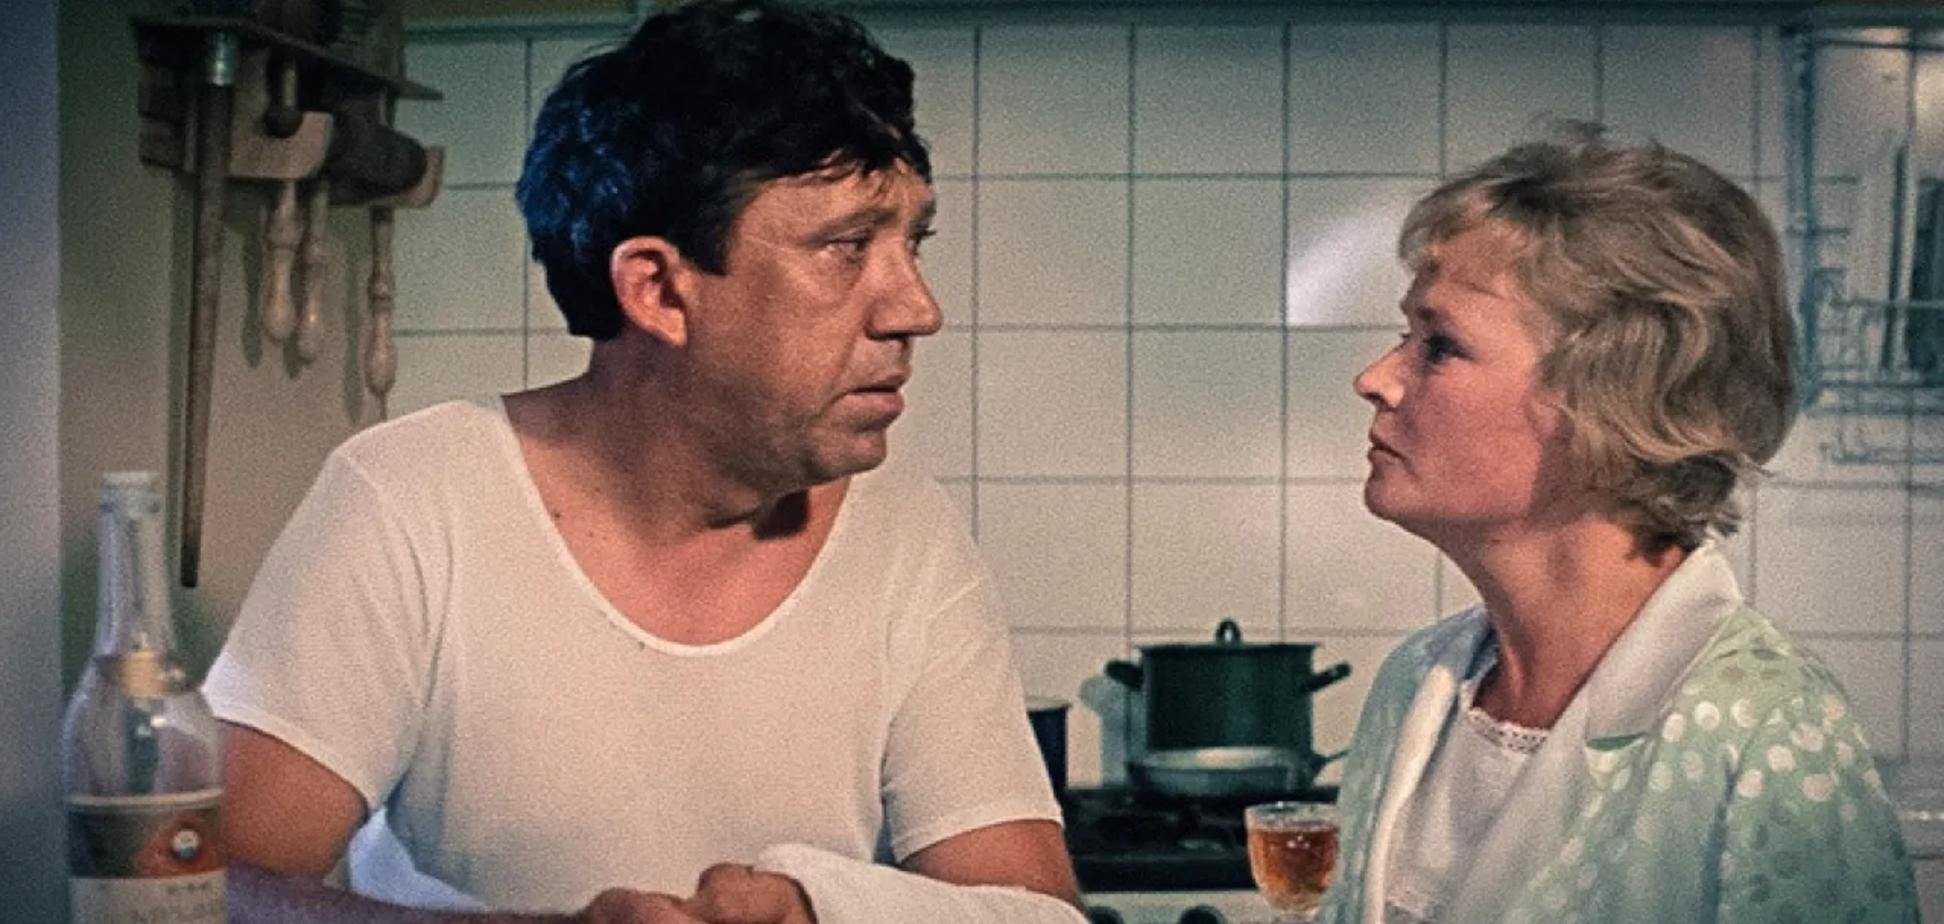 Никулин, Миронов, Гурченко: сколько получали за съемки легенды кино СССР